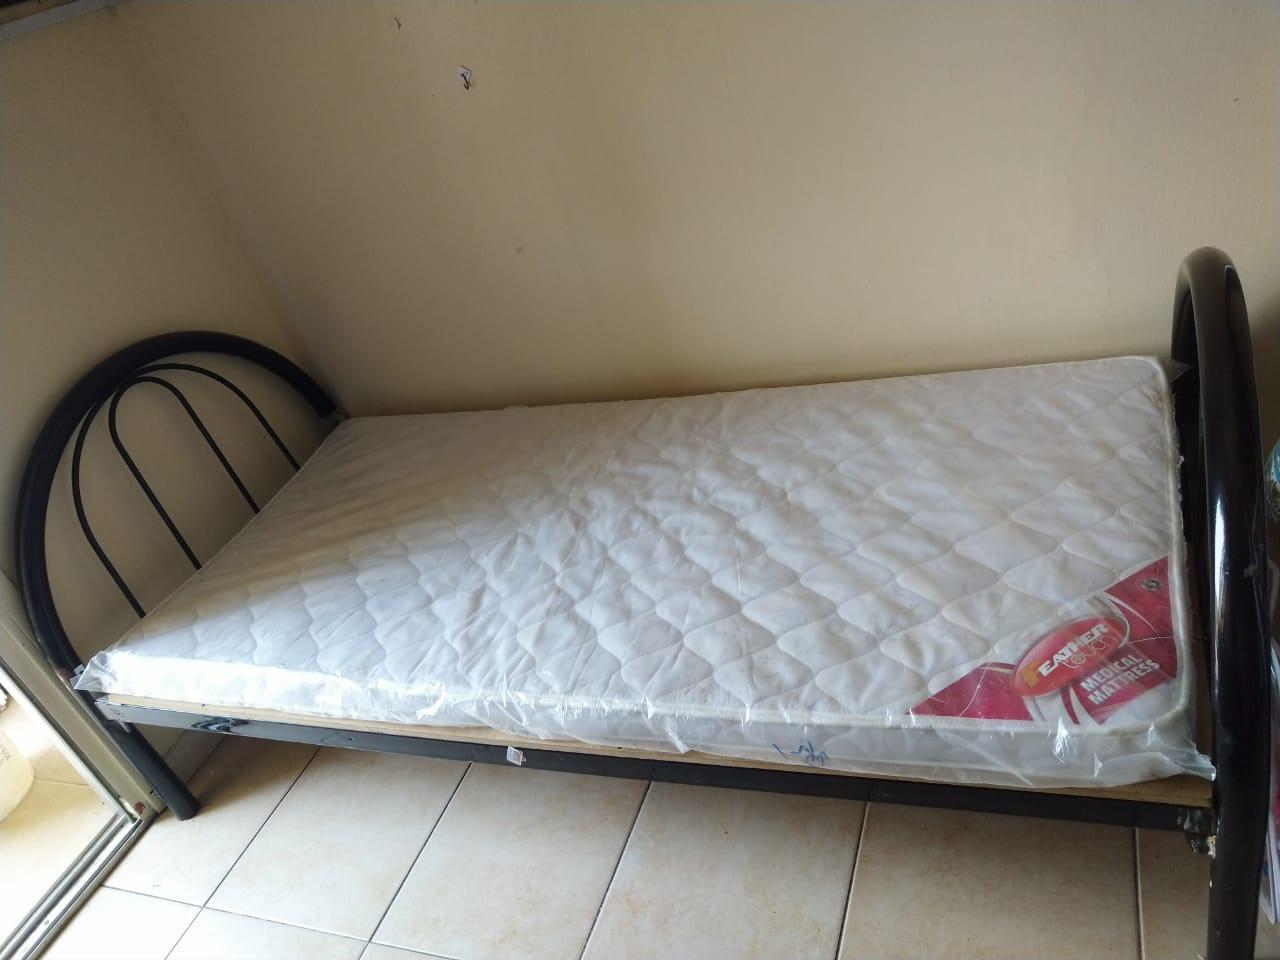 AVAILABLE LADIES BED SPACE AT BUR DUBAI DHS.600 NEAR AL GHUBAIBA METRO STATION.